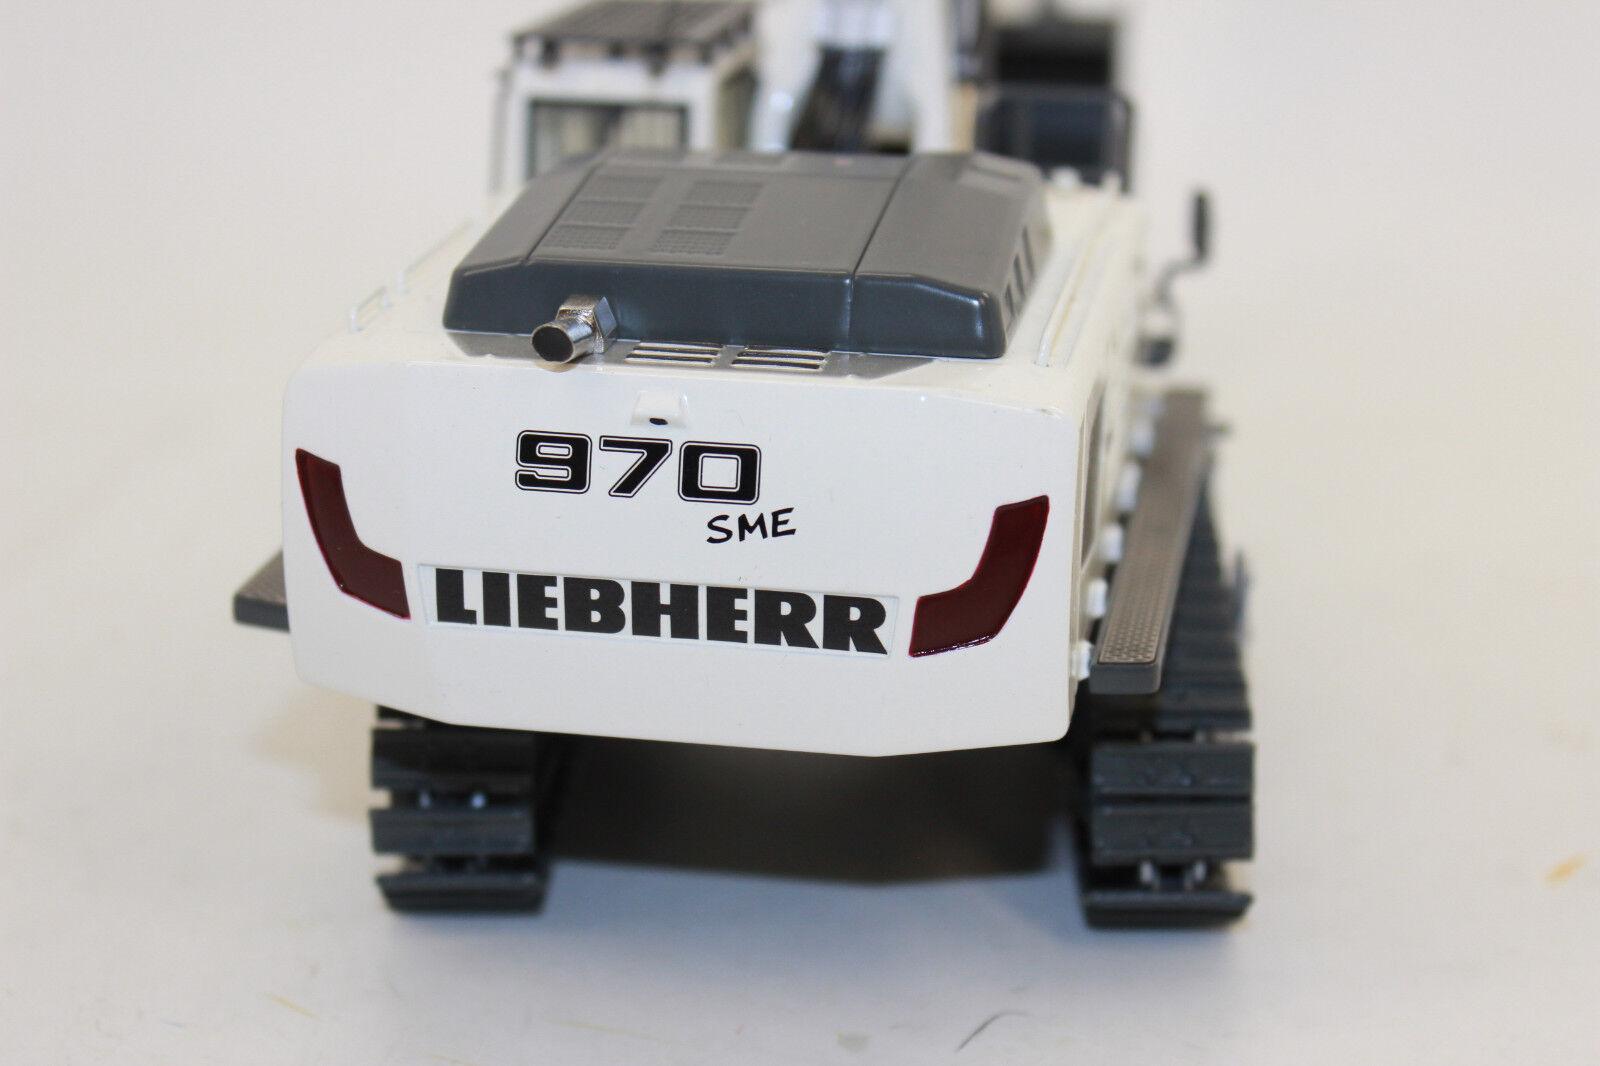 Wsi 04-1156 Liebherr R 970 Crawler Excavator White Kobi 1 50 New Boxed